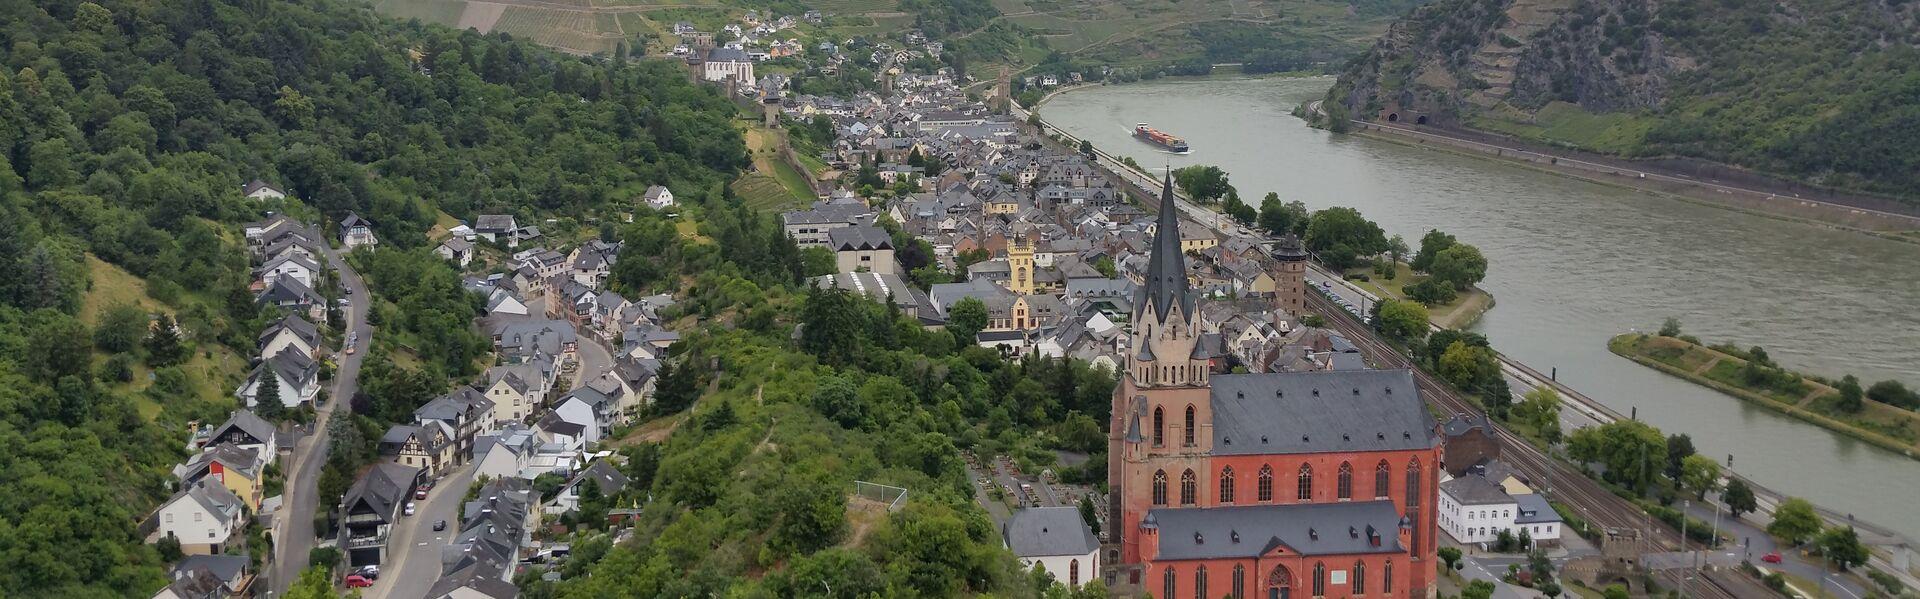 Oberwesel_Liebfrauenkirche